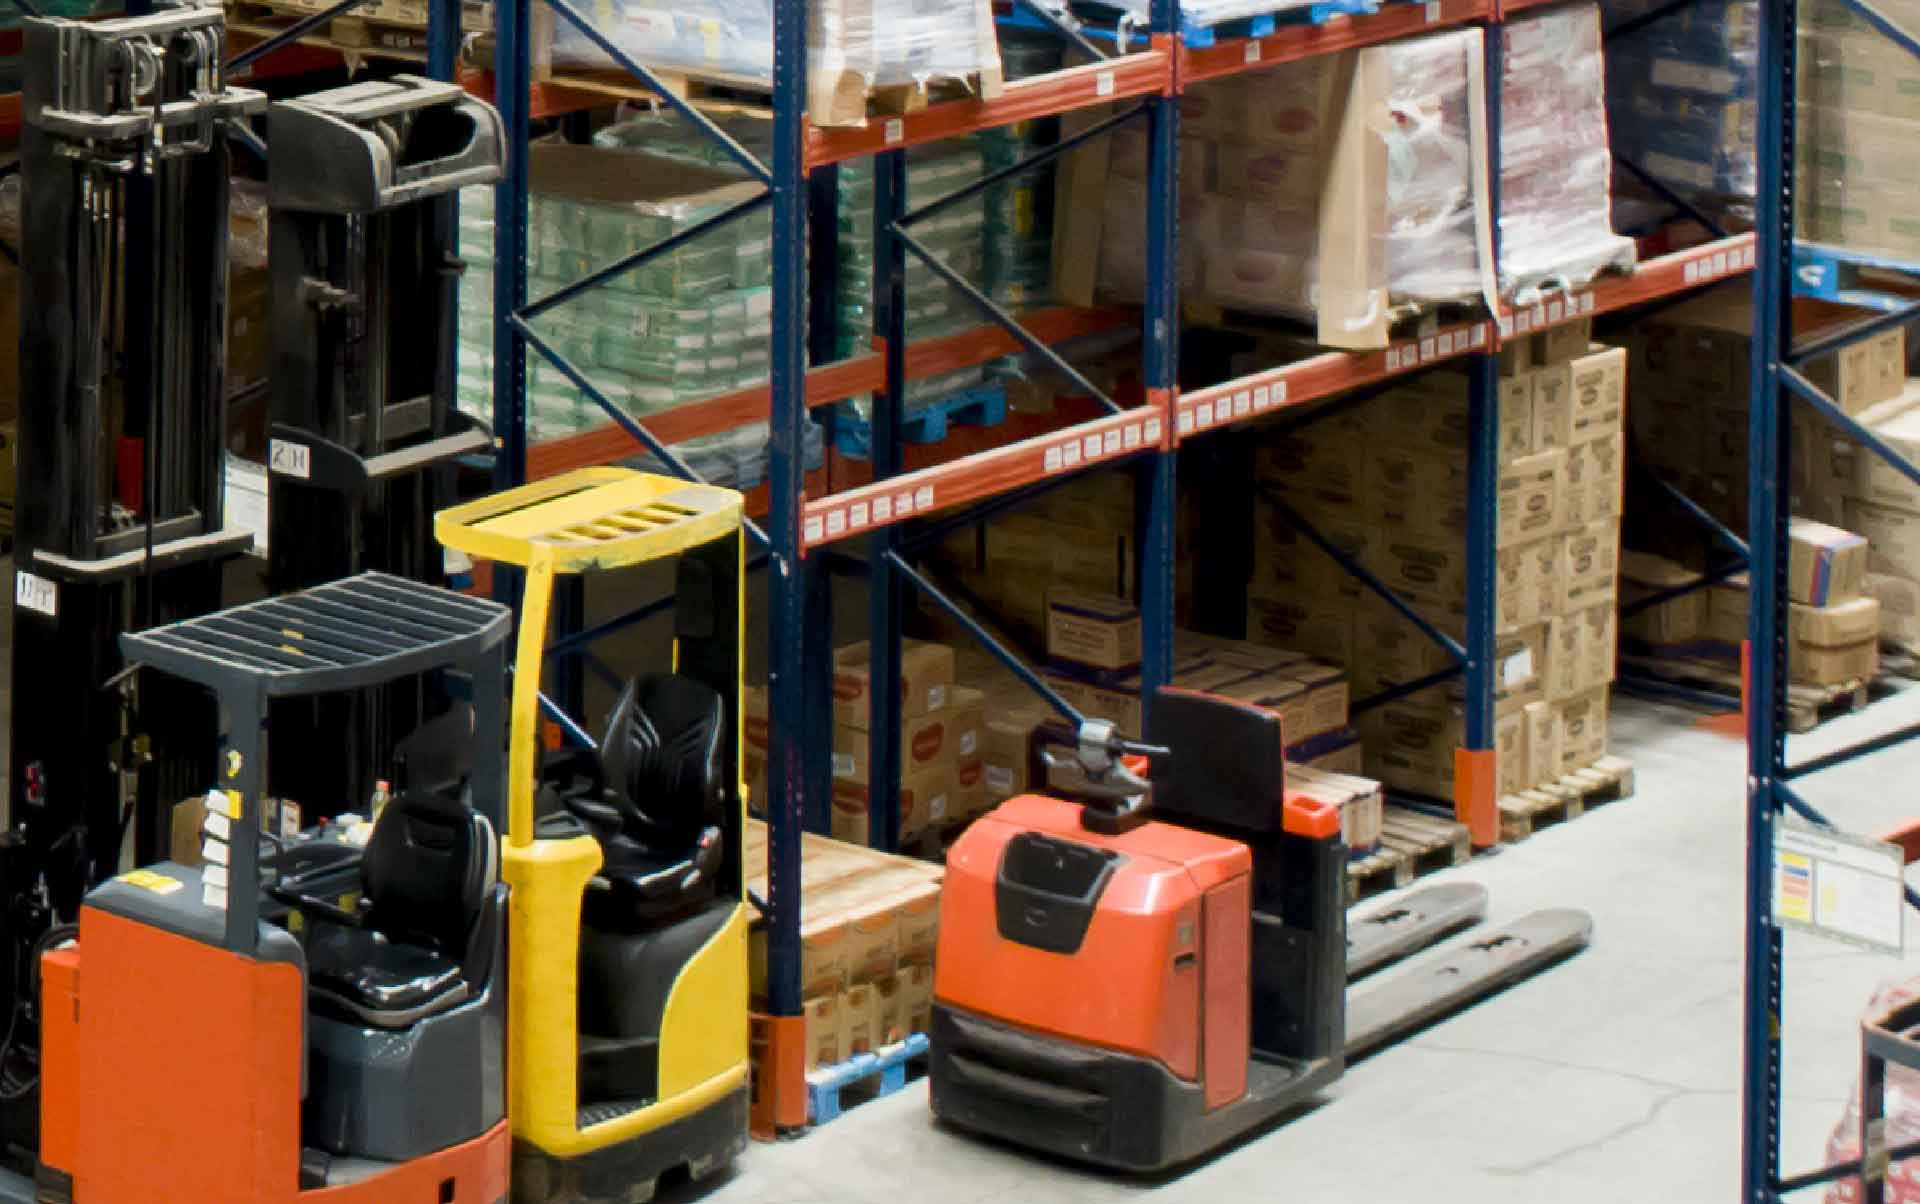 Training warehouse to professionally educate Startévo students